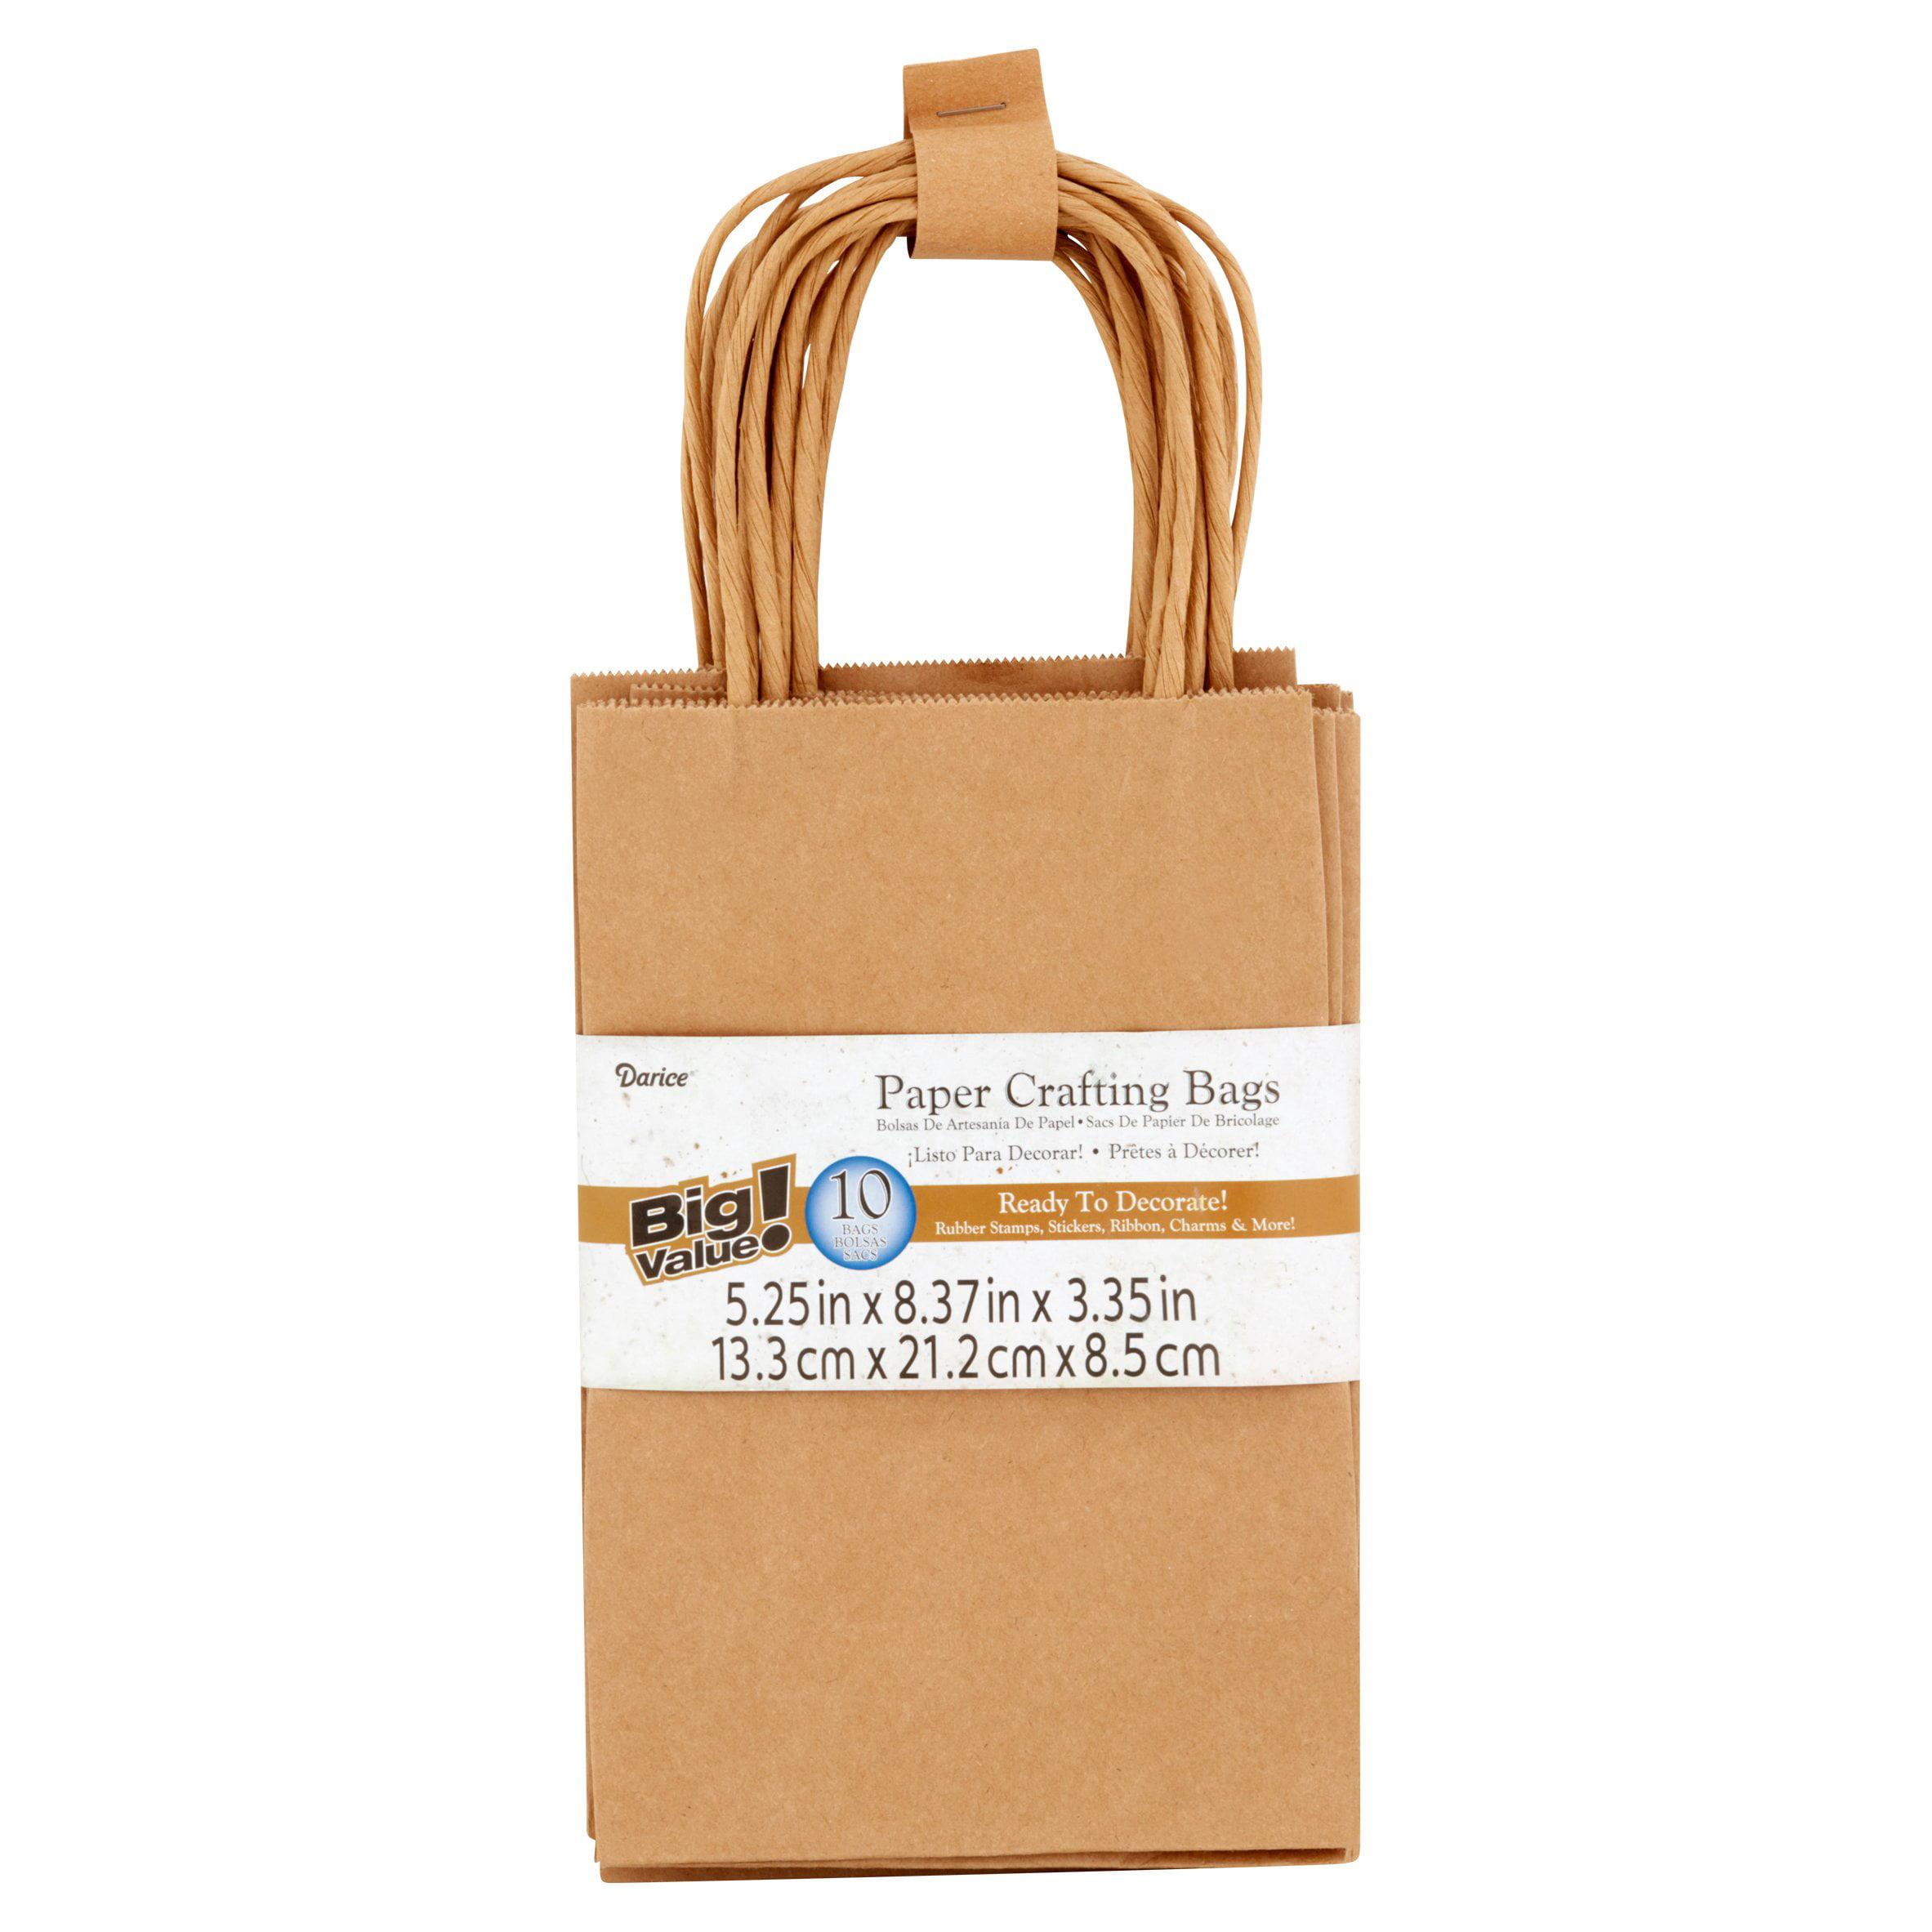 Darice Paper Crafting Bags Big Value!, 10 count